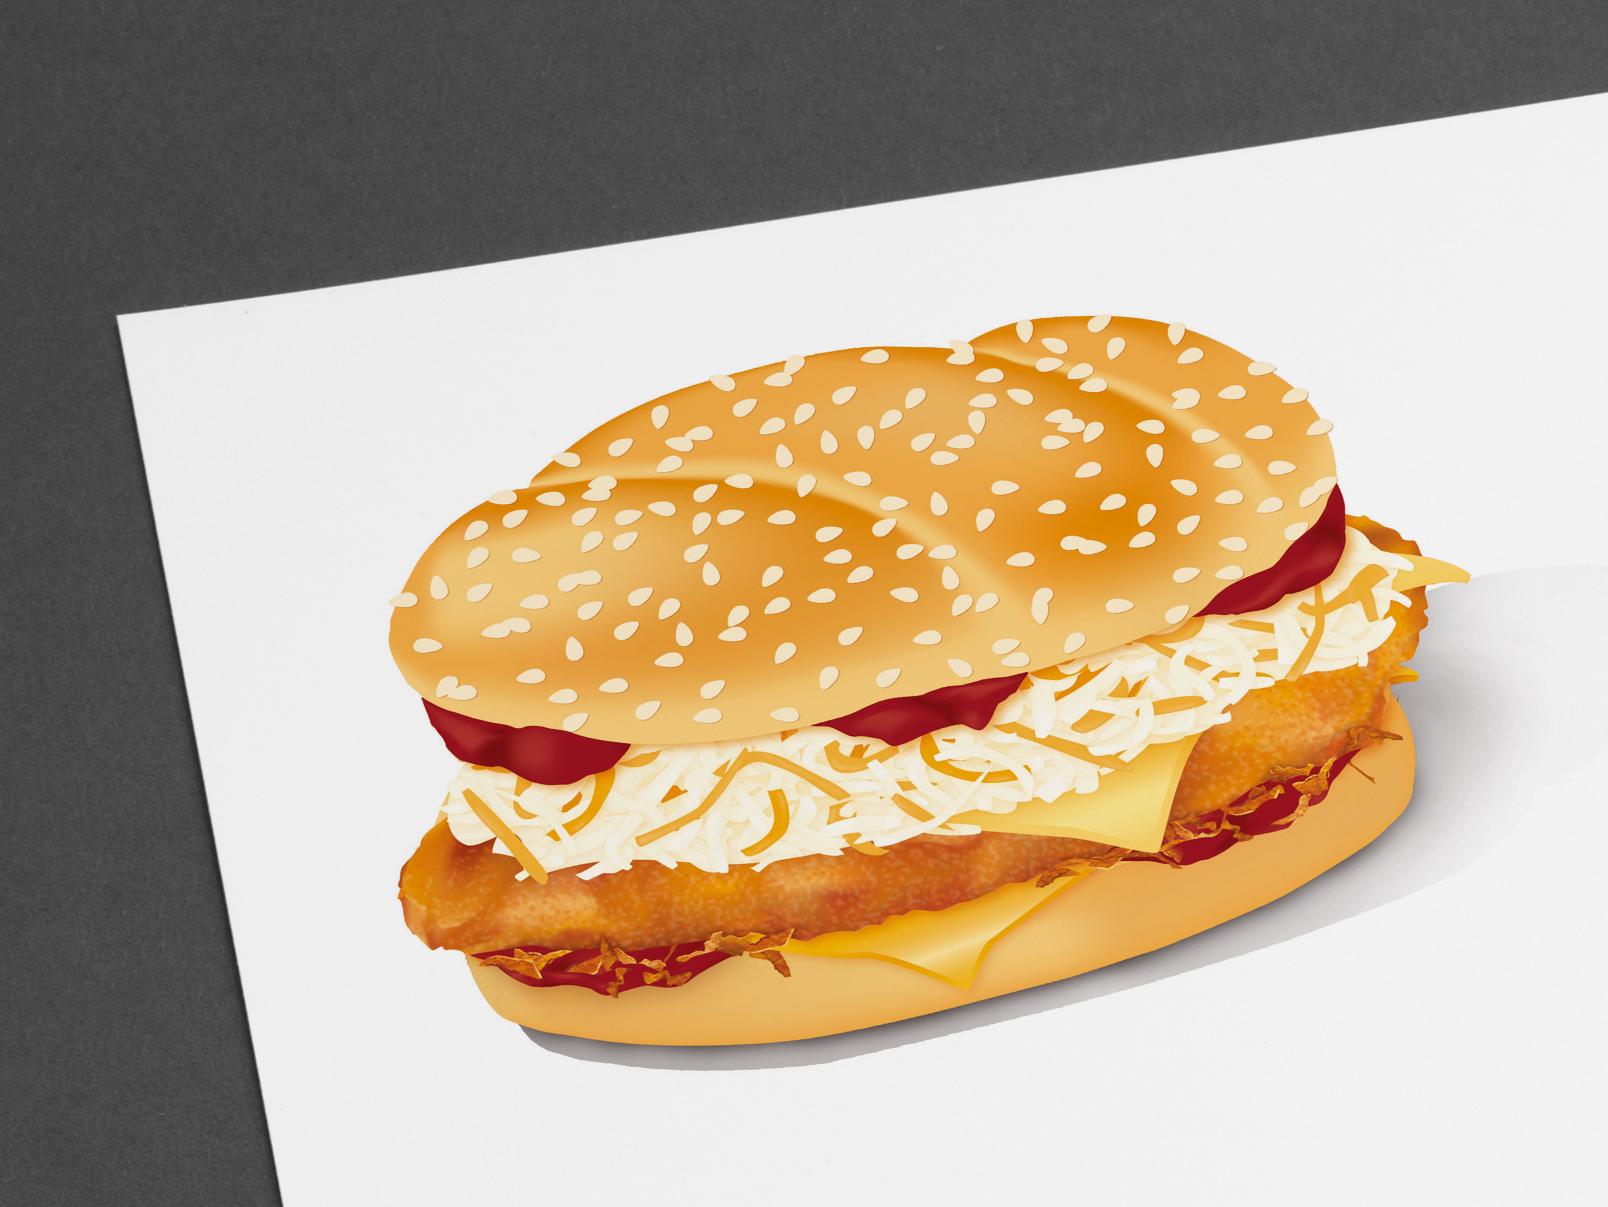 Foodillustration Burger mit Schnitzel